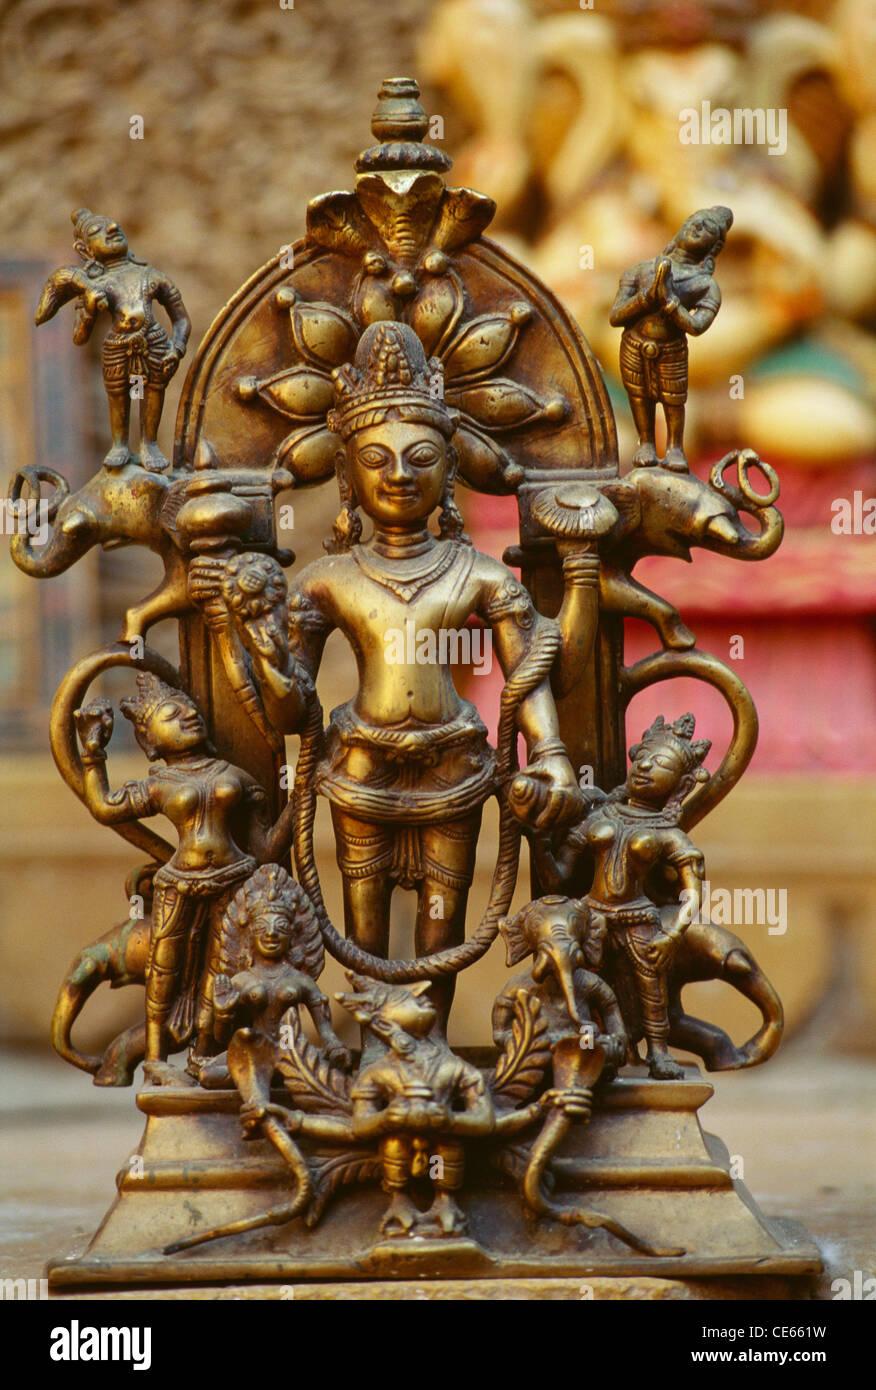 Statue of brass artefact ; Jaisalmer ; Rajasthan ; India - Stock Image